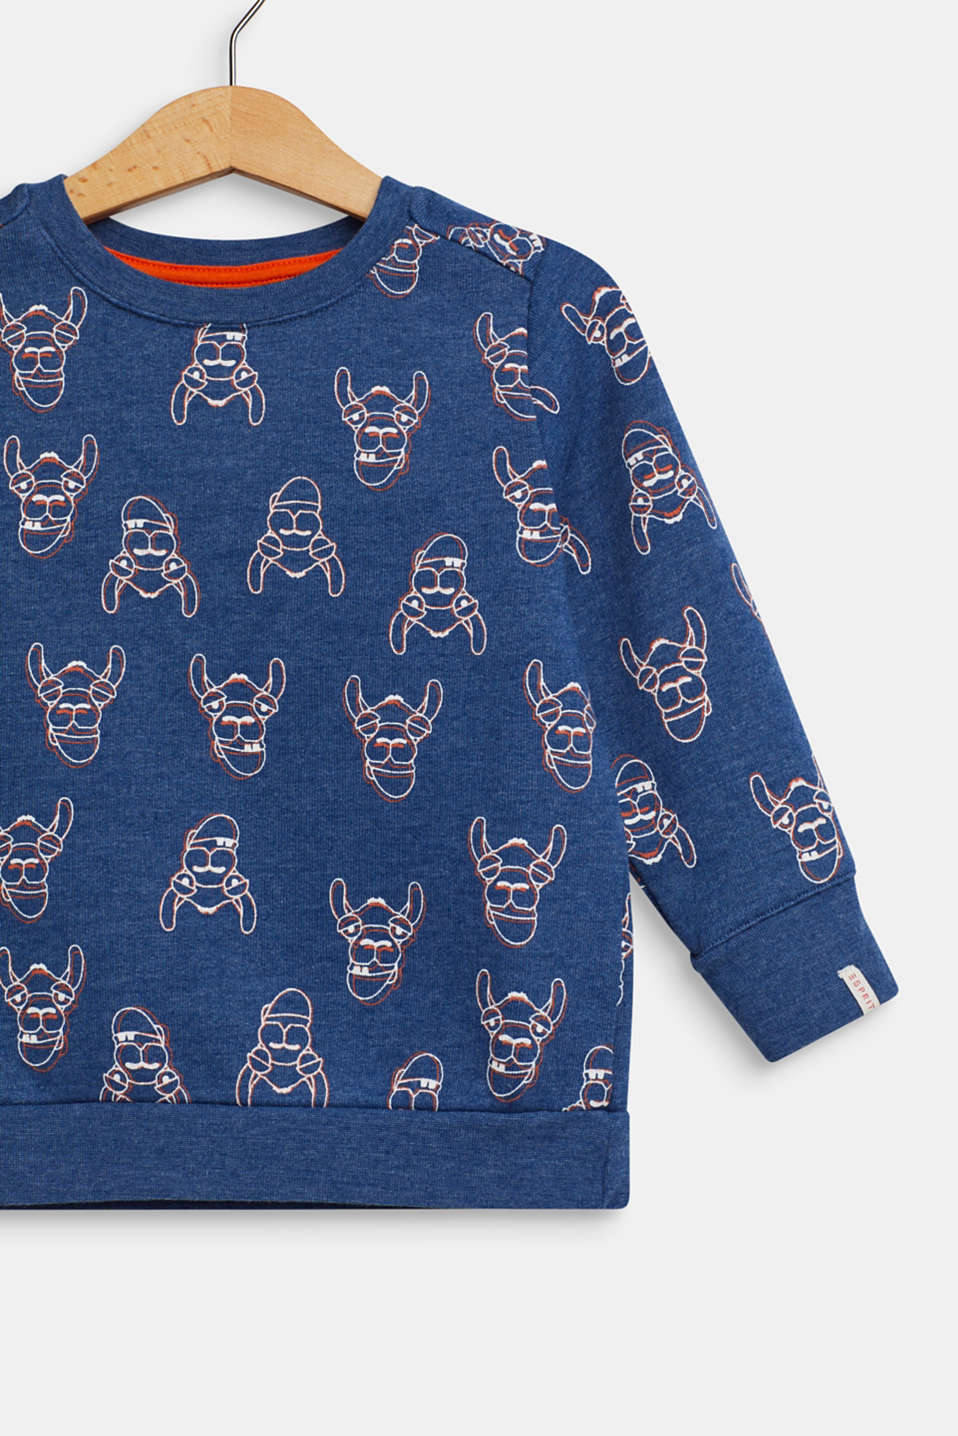 Sweatshirt with a llama print, indigo, detail image number 2